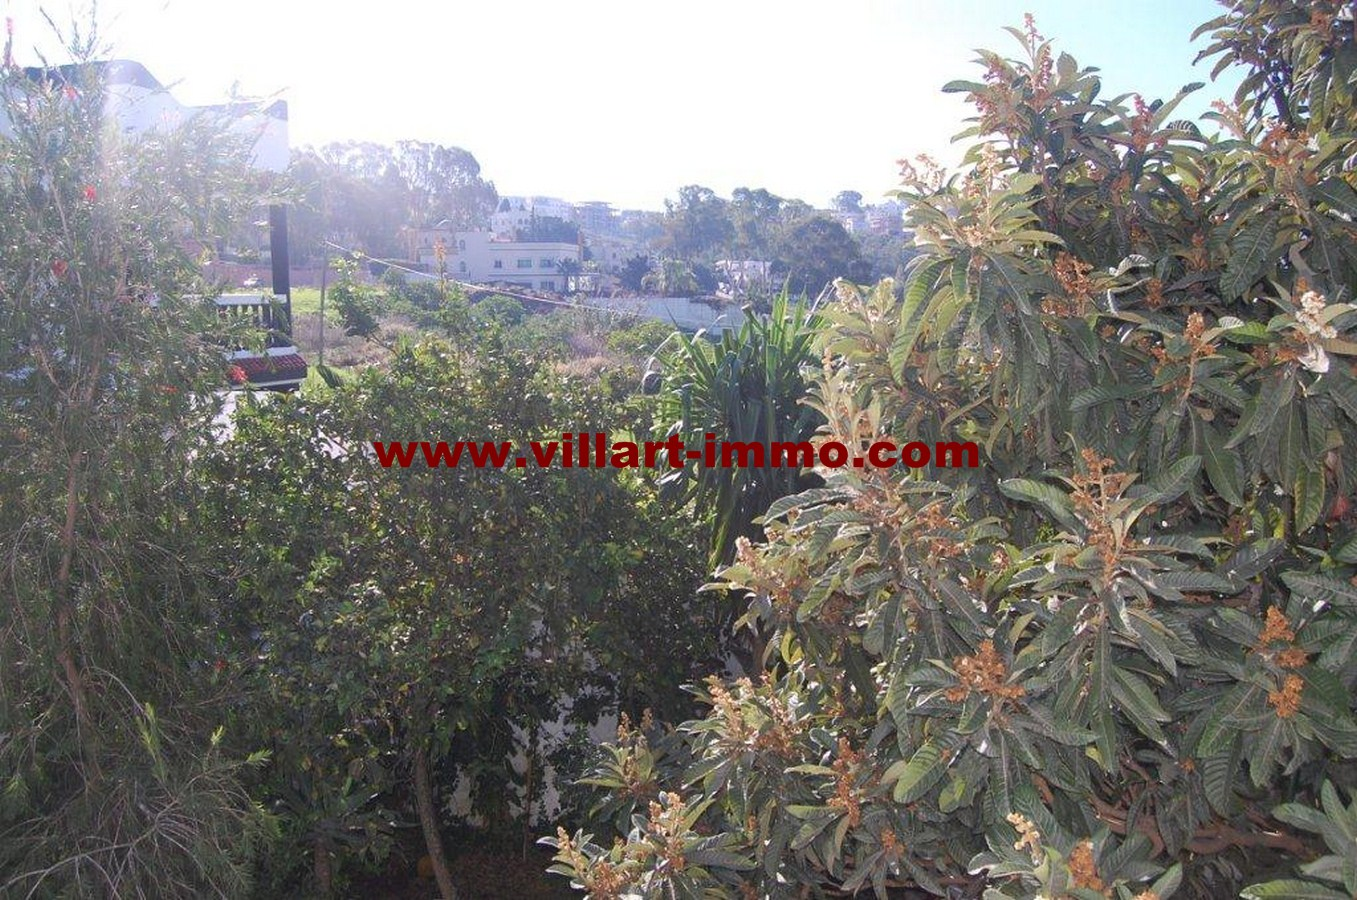 12-a-vendre-tanger-villa-californie-vue-vv461-villart-immo-agence-immobiliere-copier